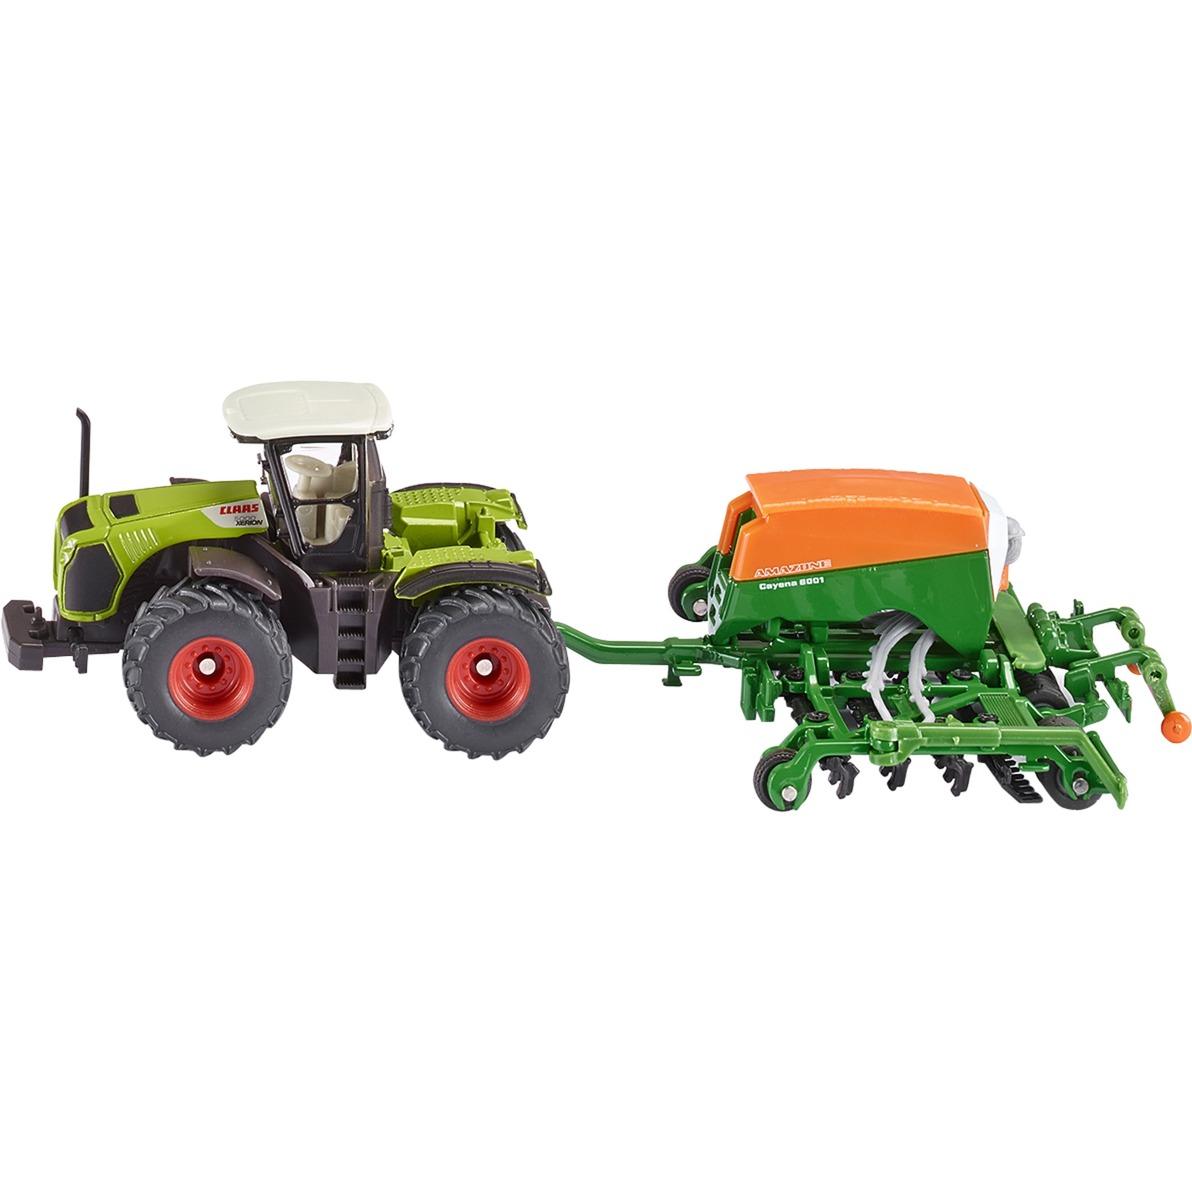 1826 modelo de vehículo de tierra Previamente montado Modelo a escala de tractor 1:87, Automóvil de construcción